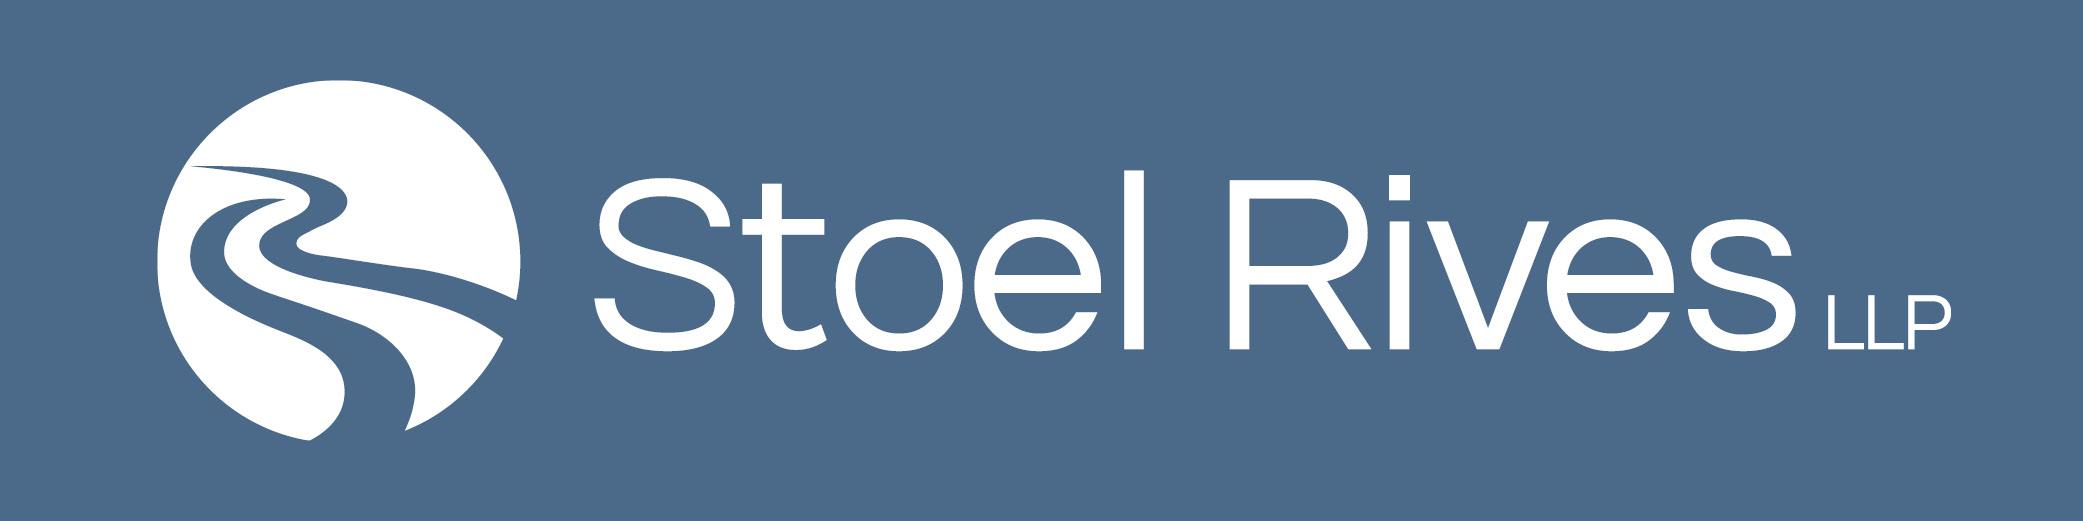 New Logo - White on Blue Background